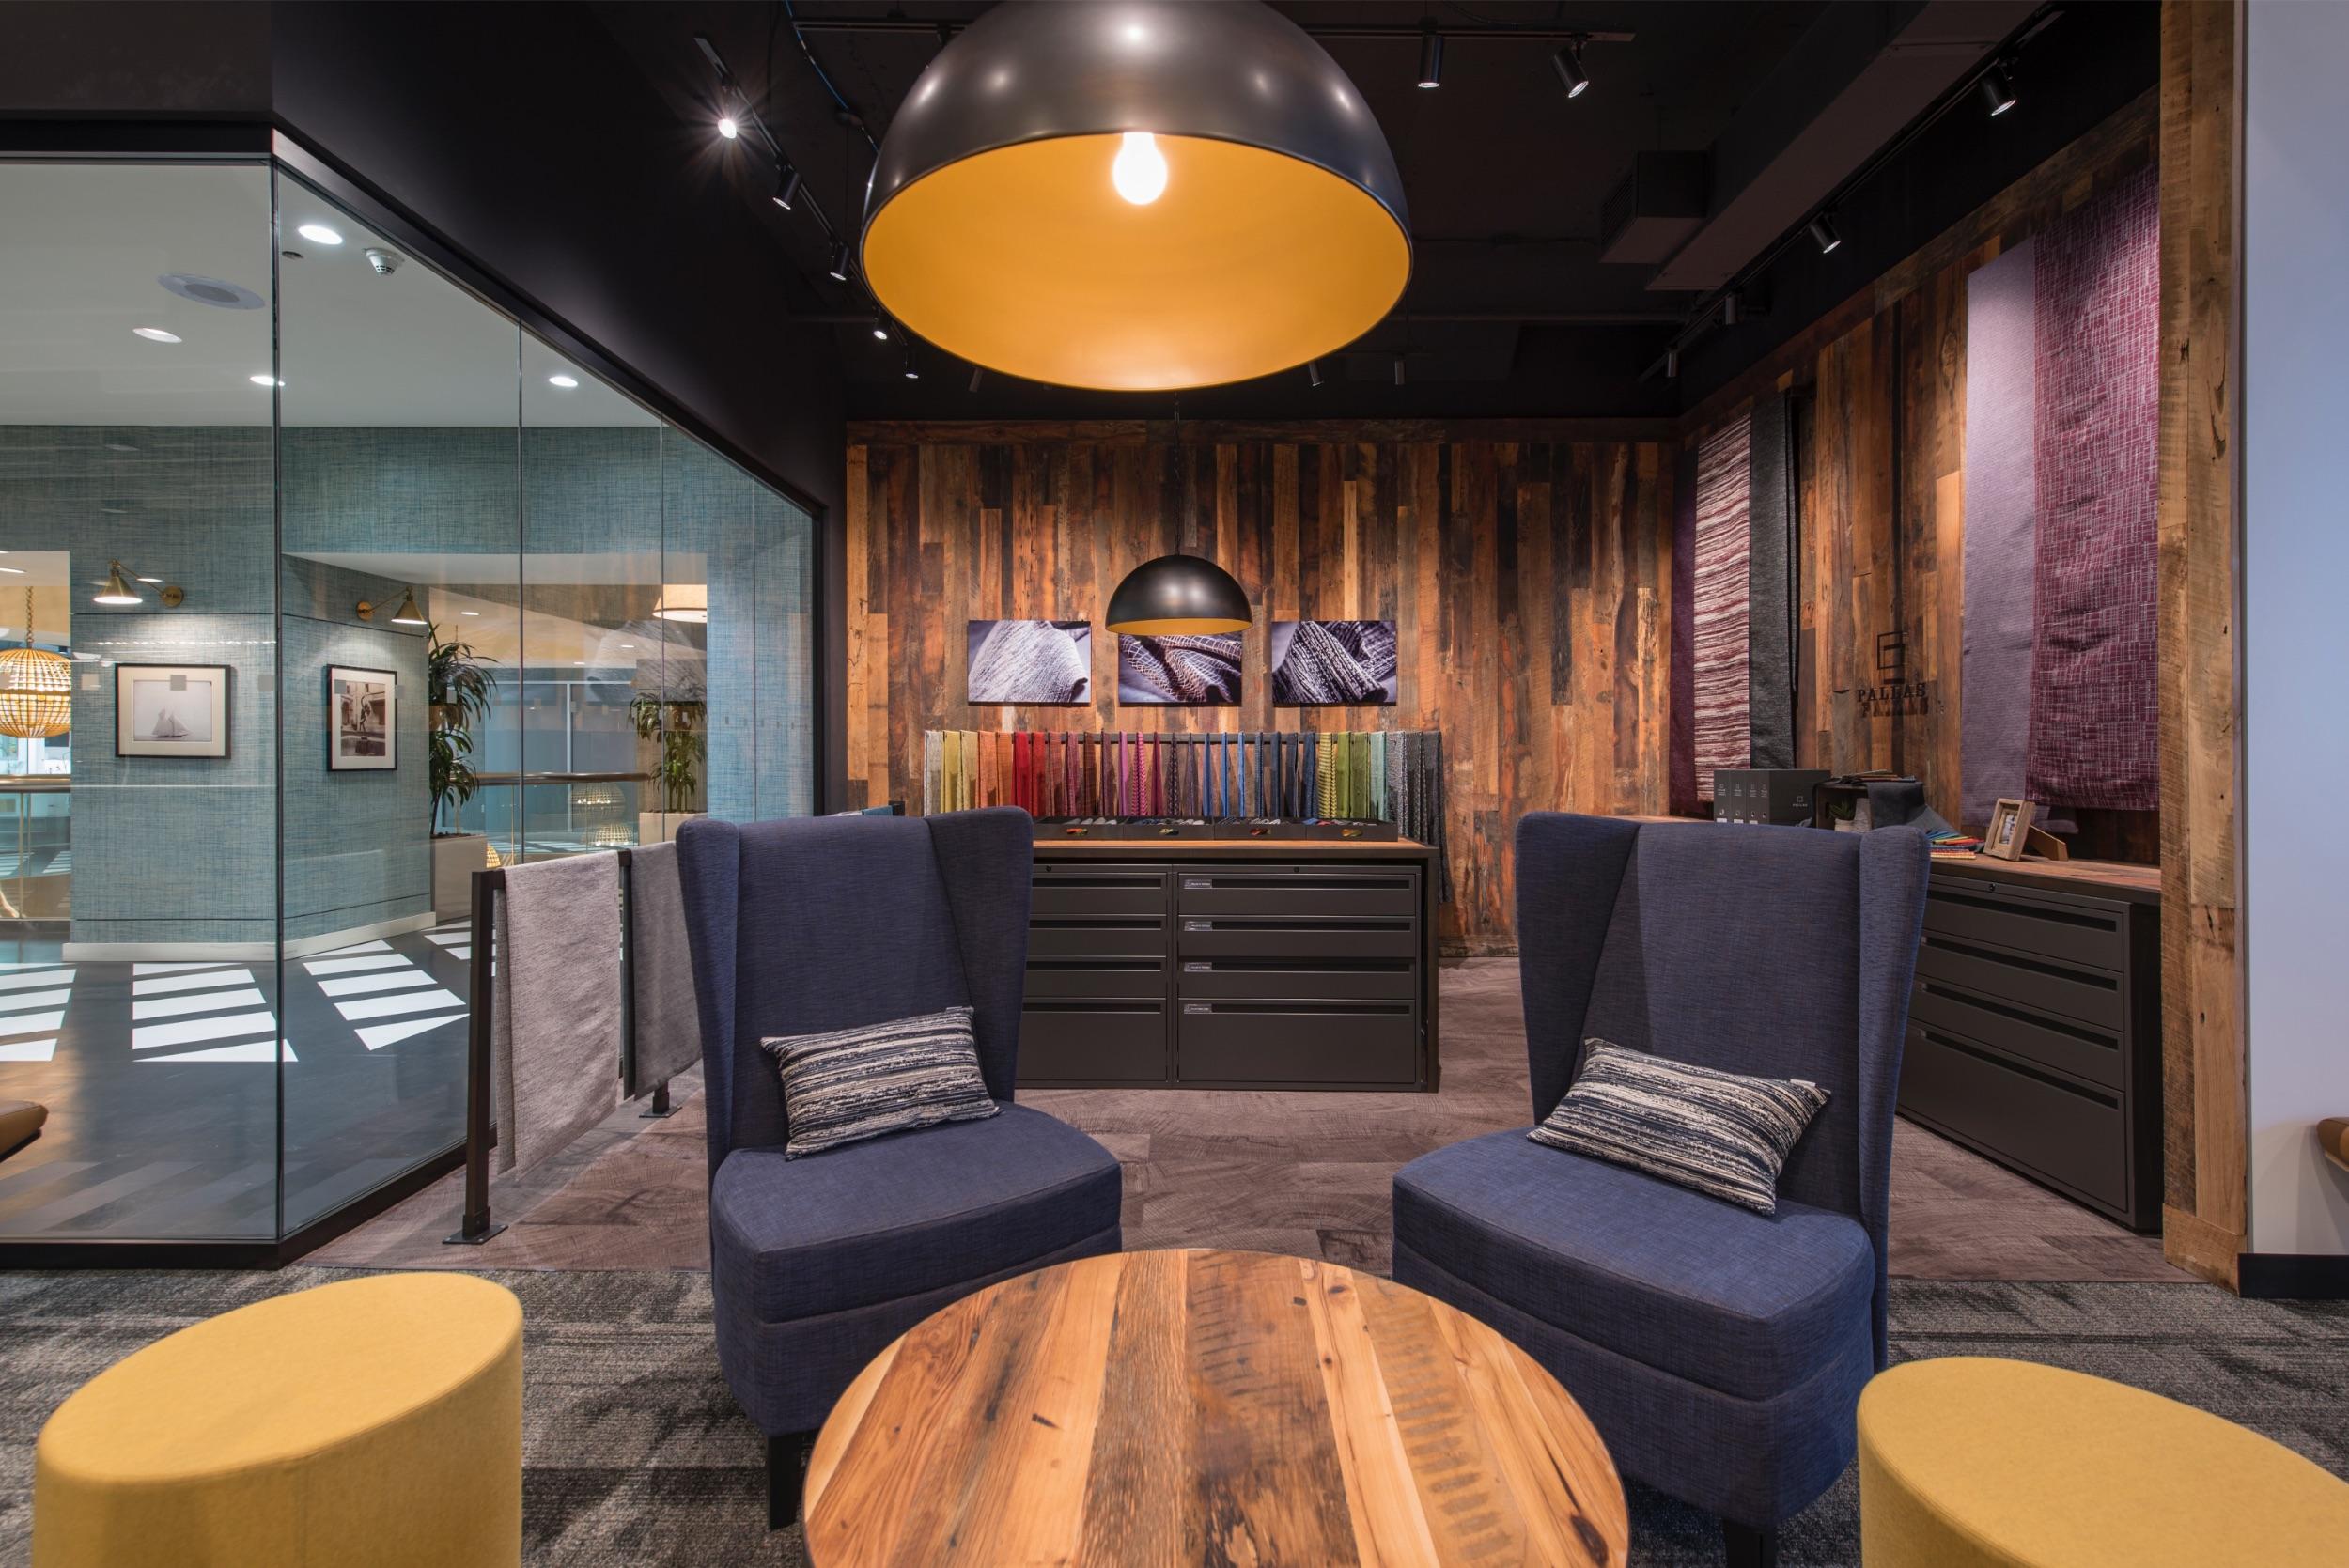 Corderman_Construction_KI_Showroom_Boston_Design_Center_Millwork_Wall.jpg